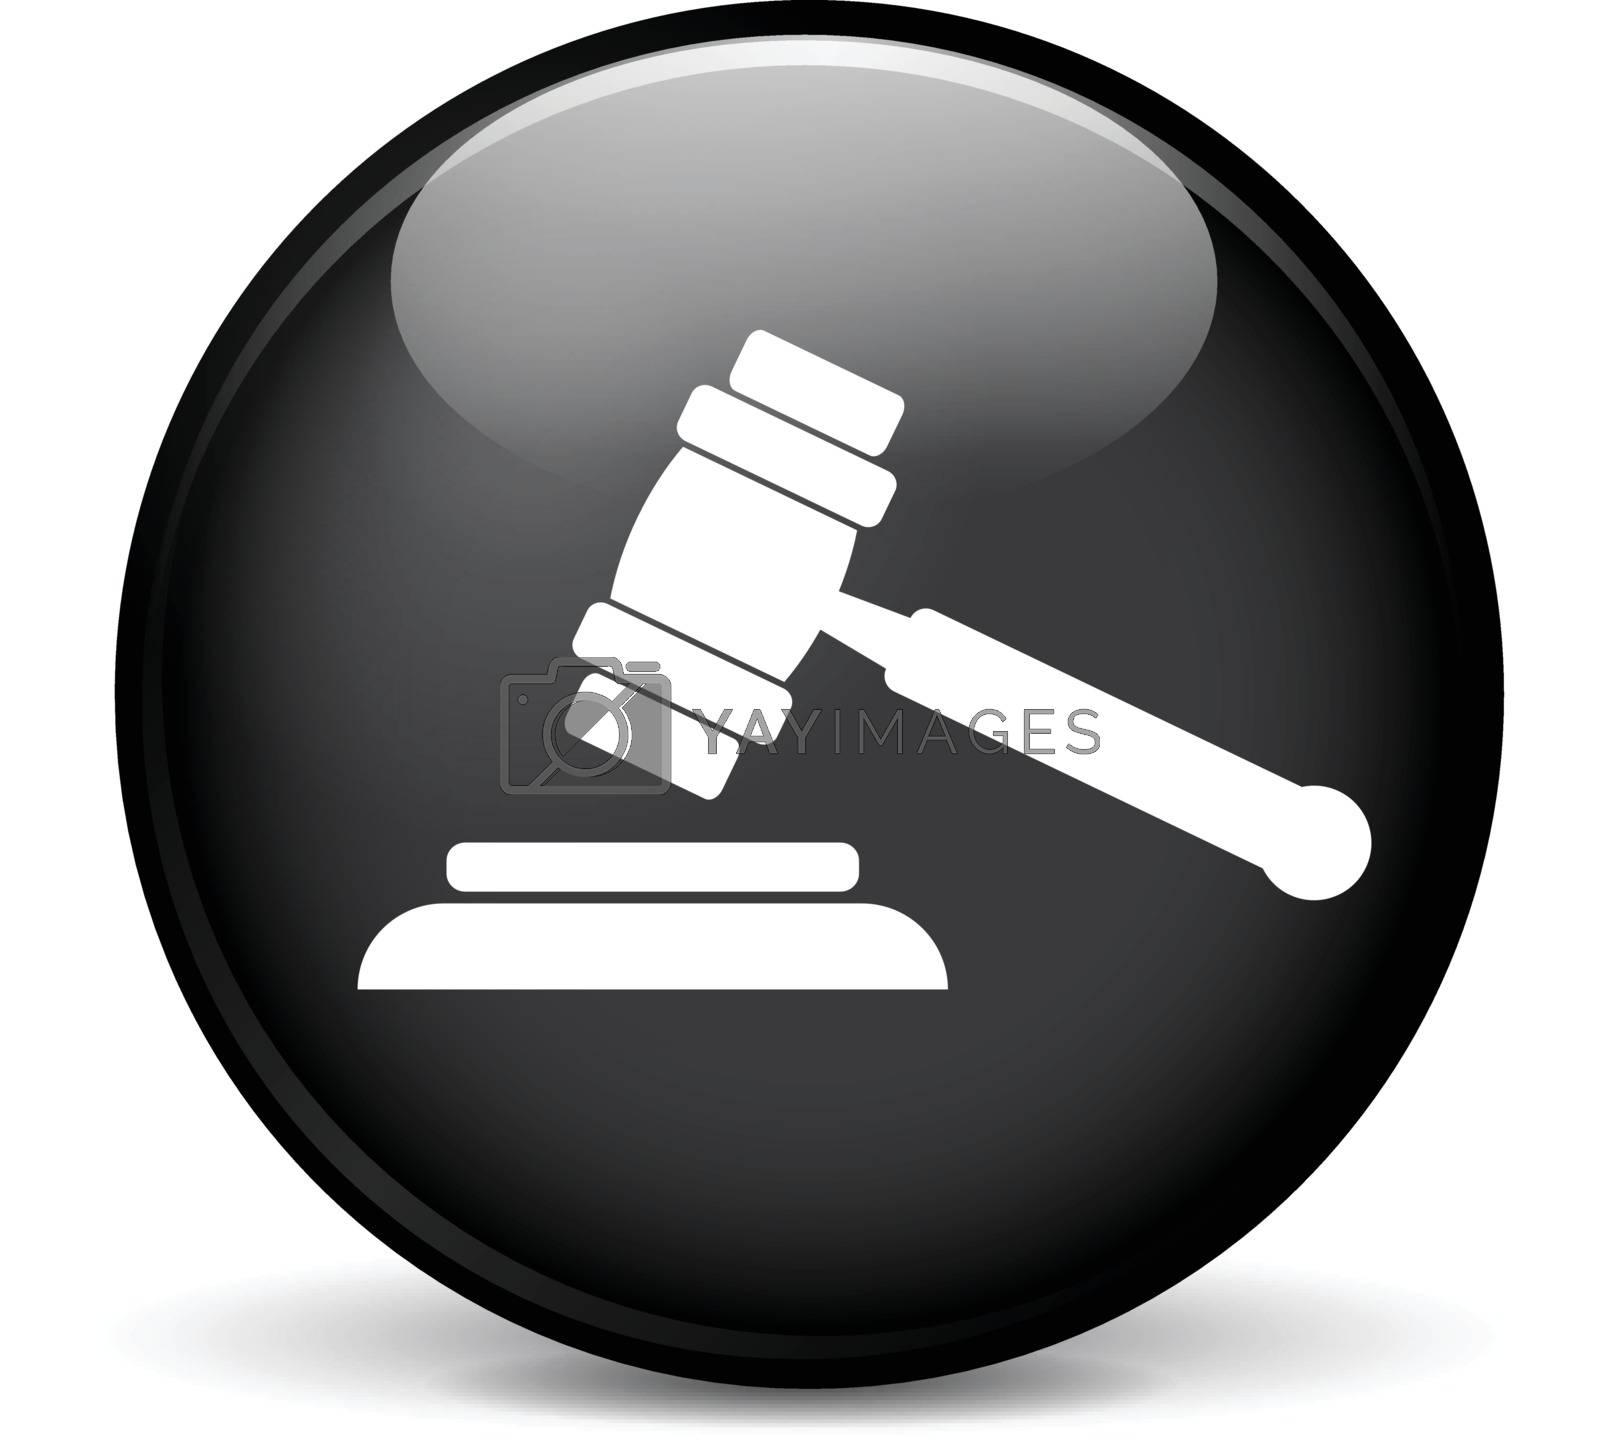 Illustration of law modern design black sphere icon